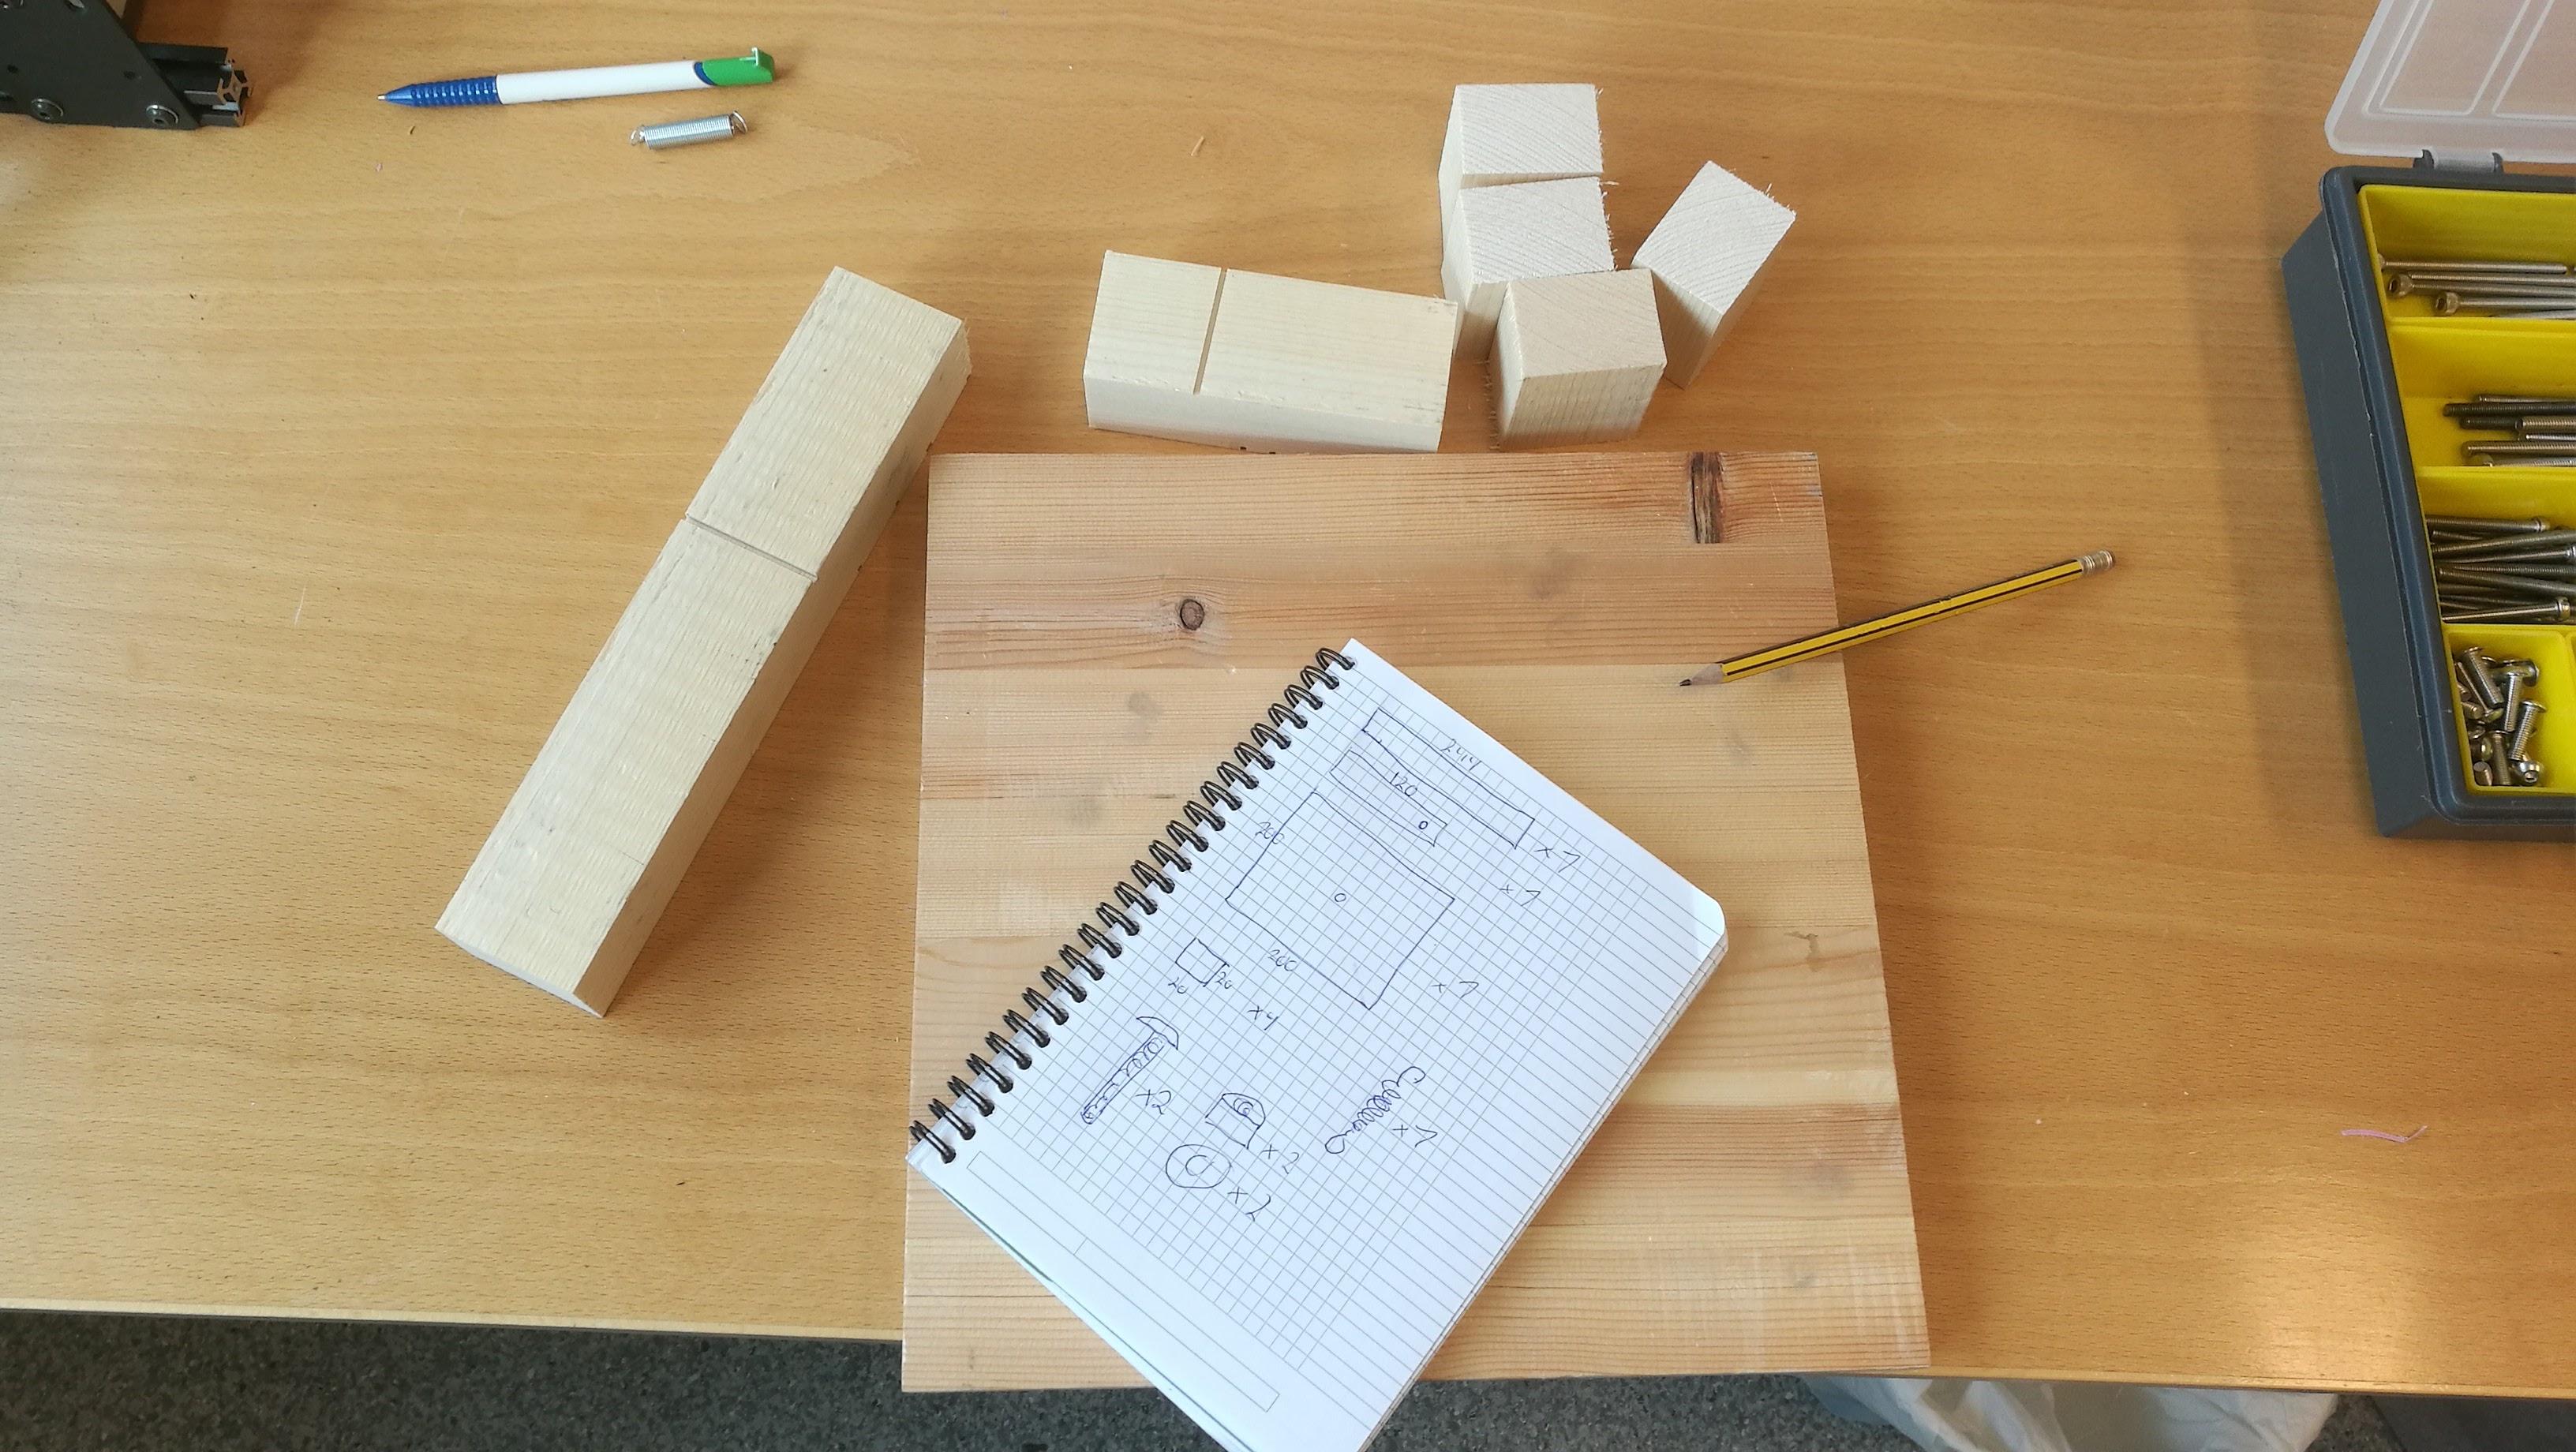 Building a Quick & Dirty Foam Cutter